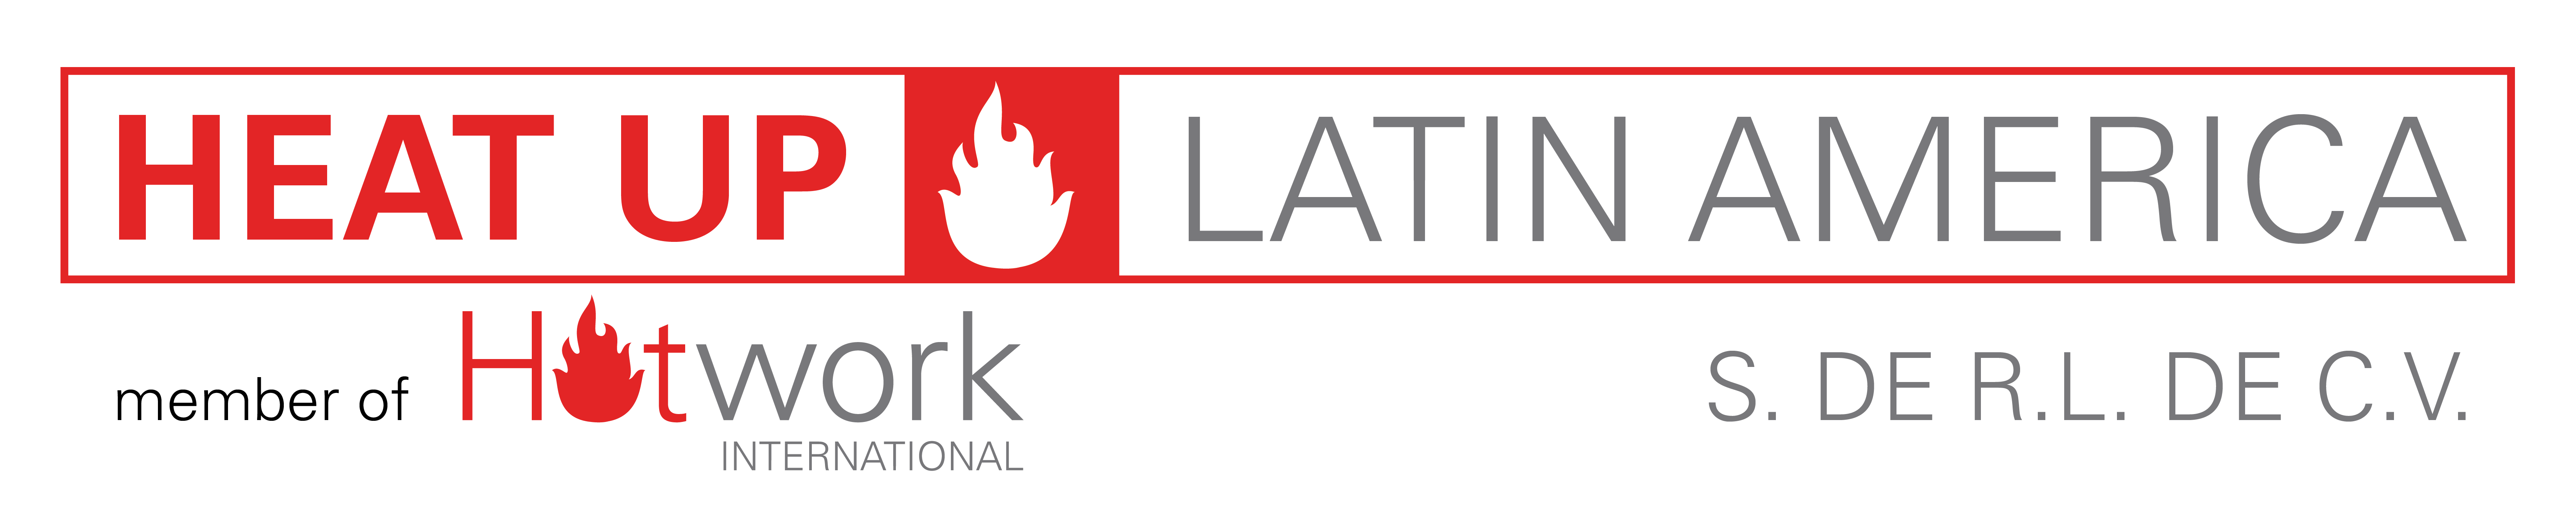 Heat Up Latin America